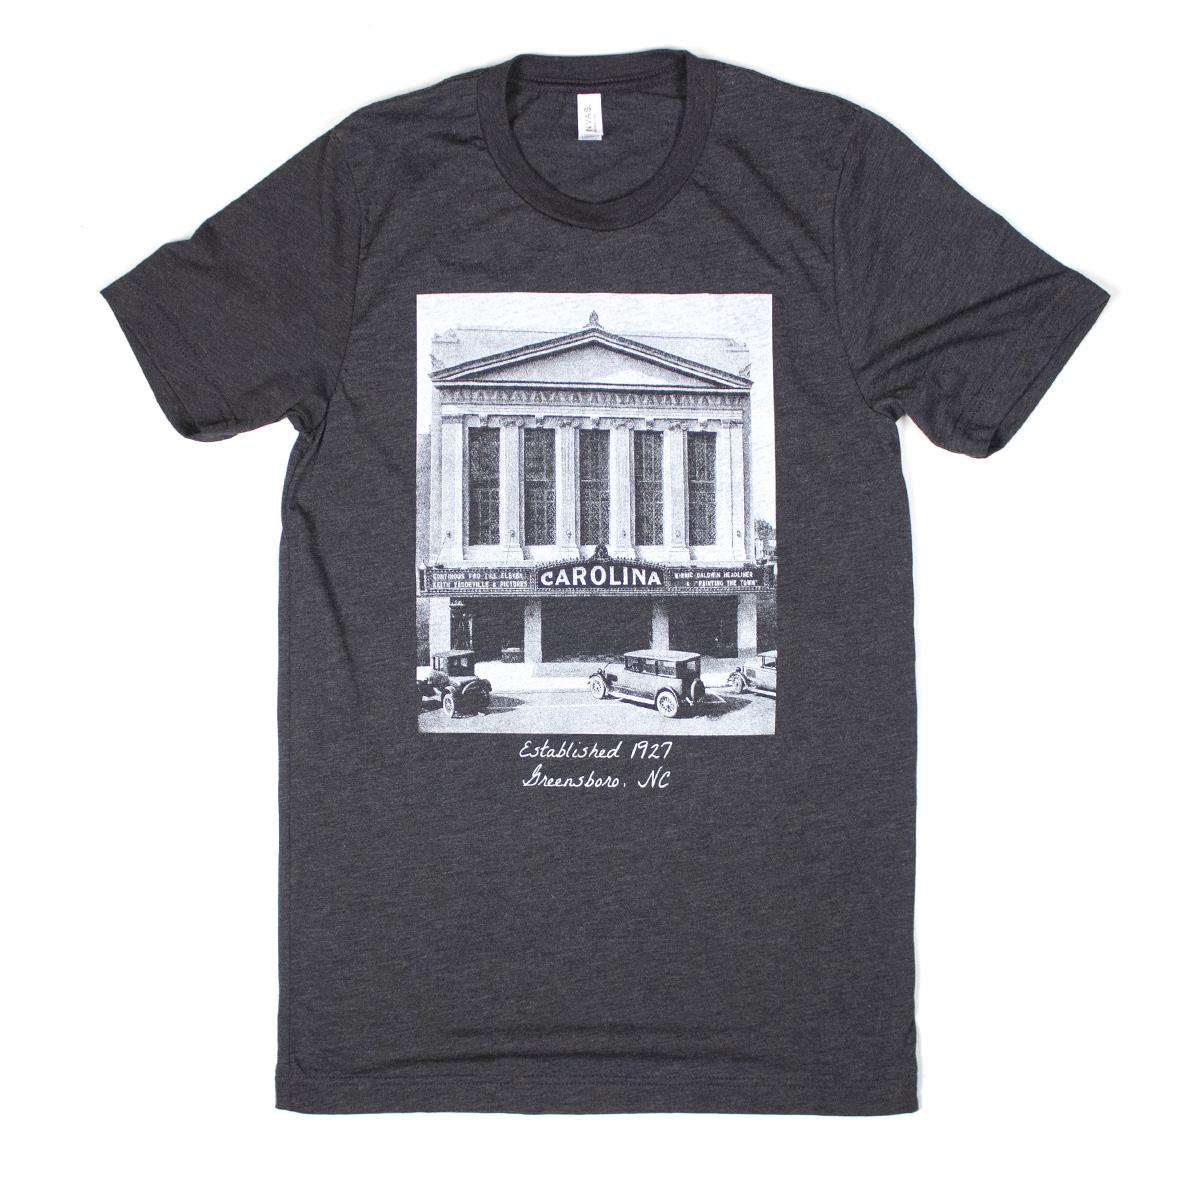 Carolina-Theatre-Photo-Shirt copy.jpg